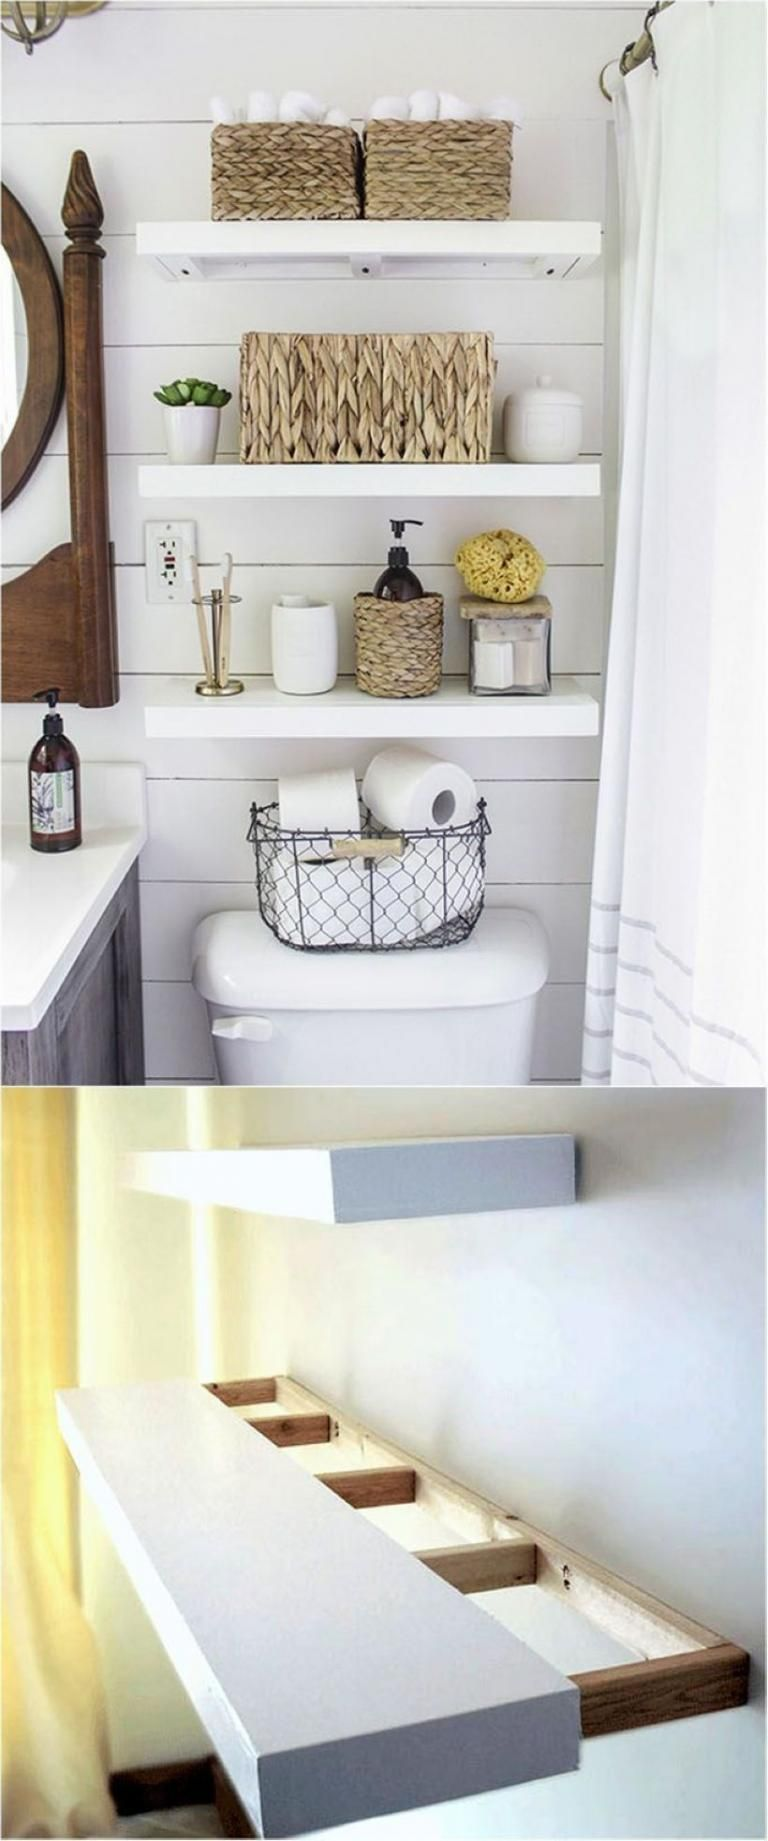 Best DIY Floating Shelves and Bathroom Ideas Shelves